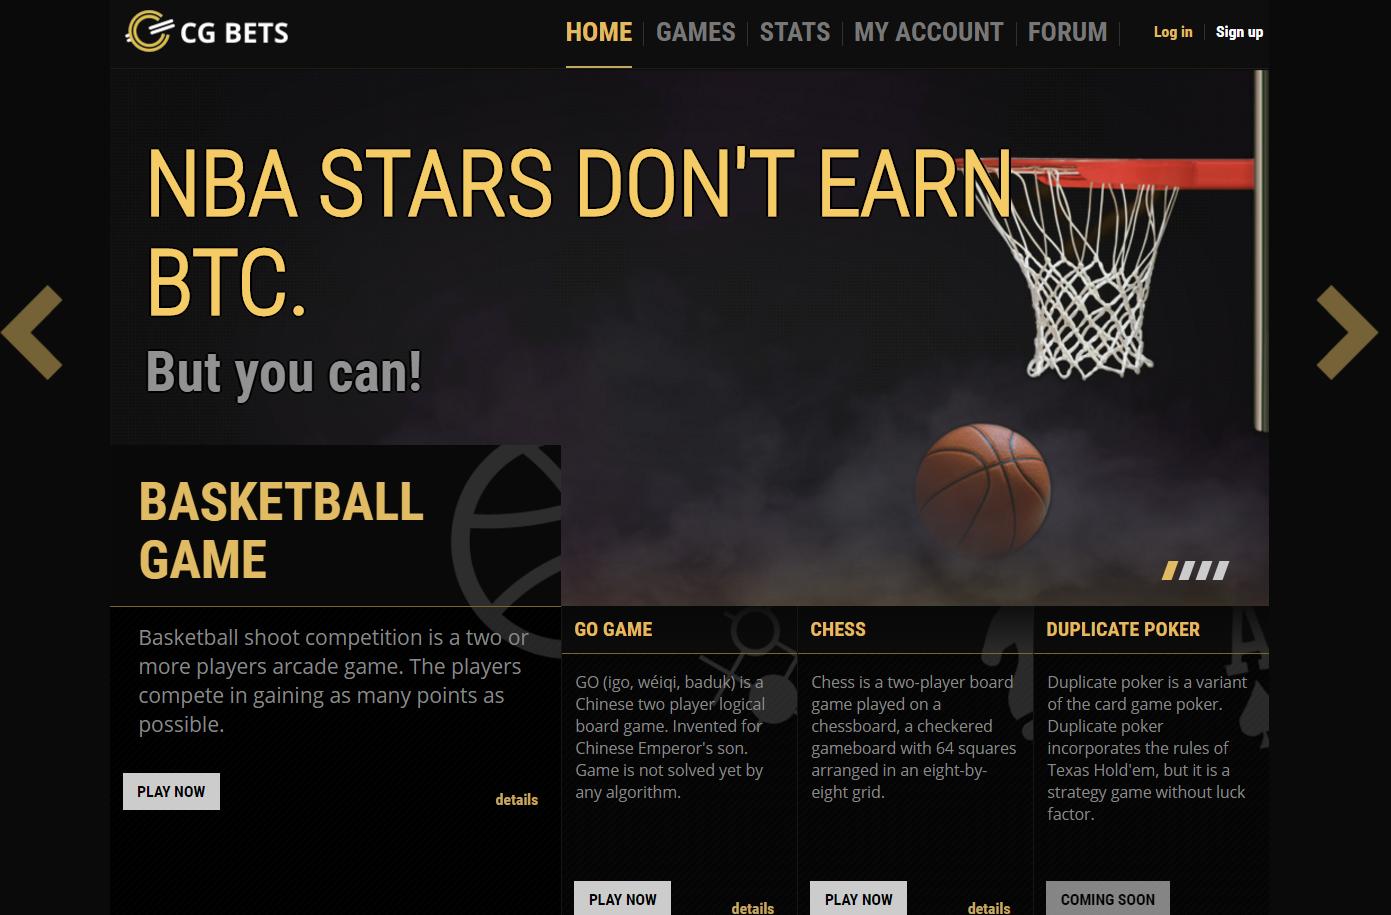 CGBets homepage